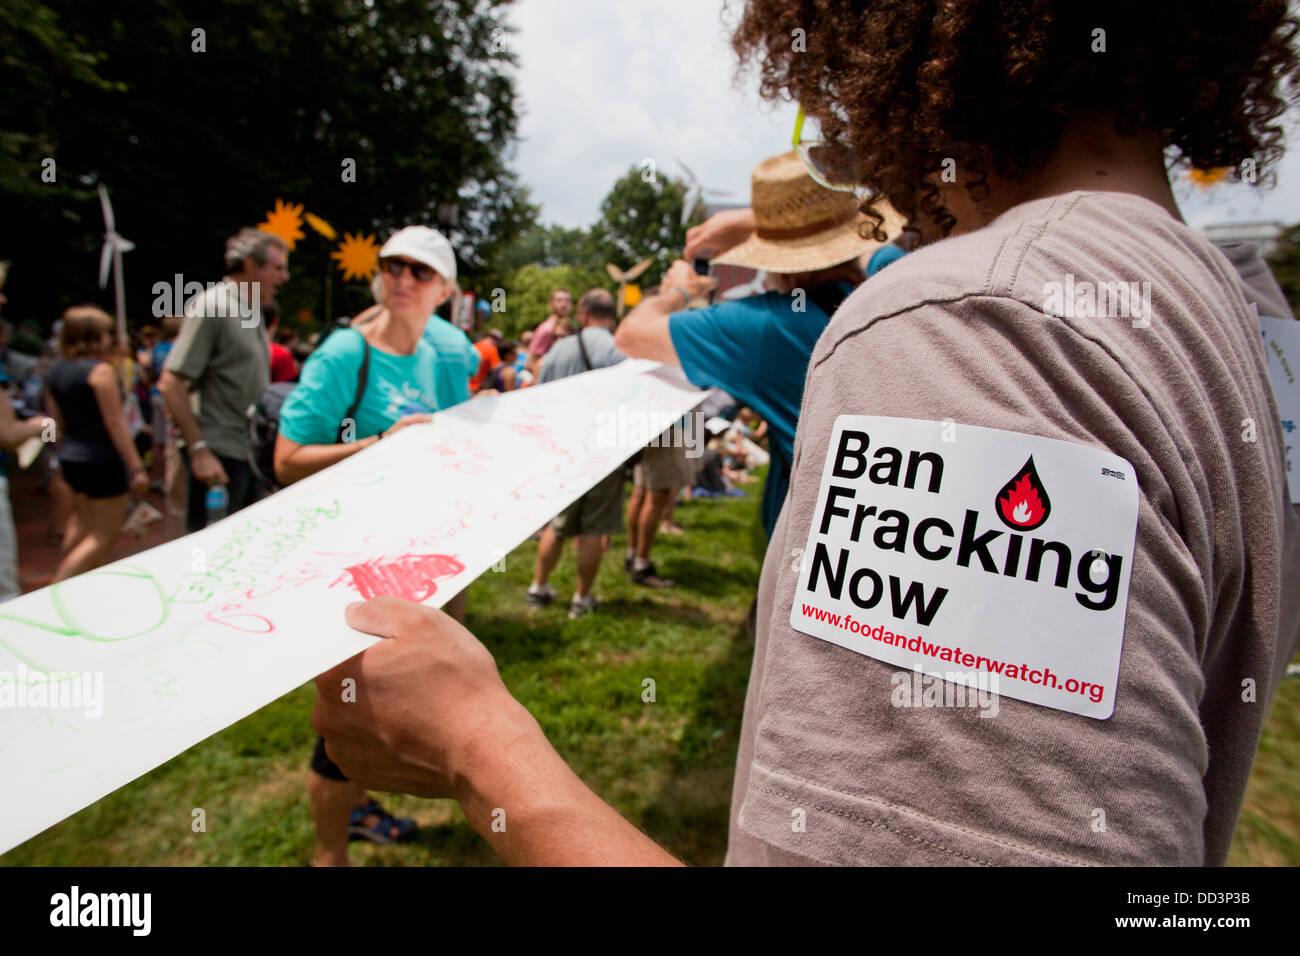 Fracking protester - Washington, DC USA - Stock Image